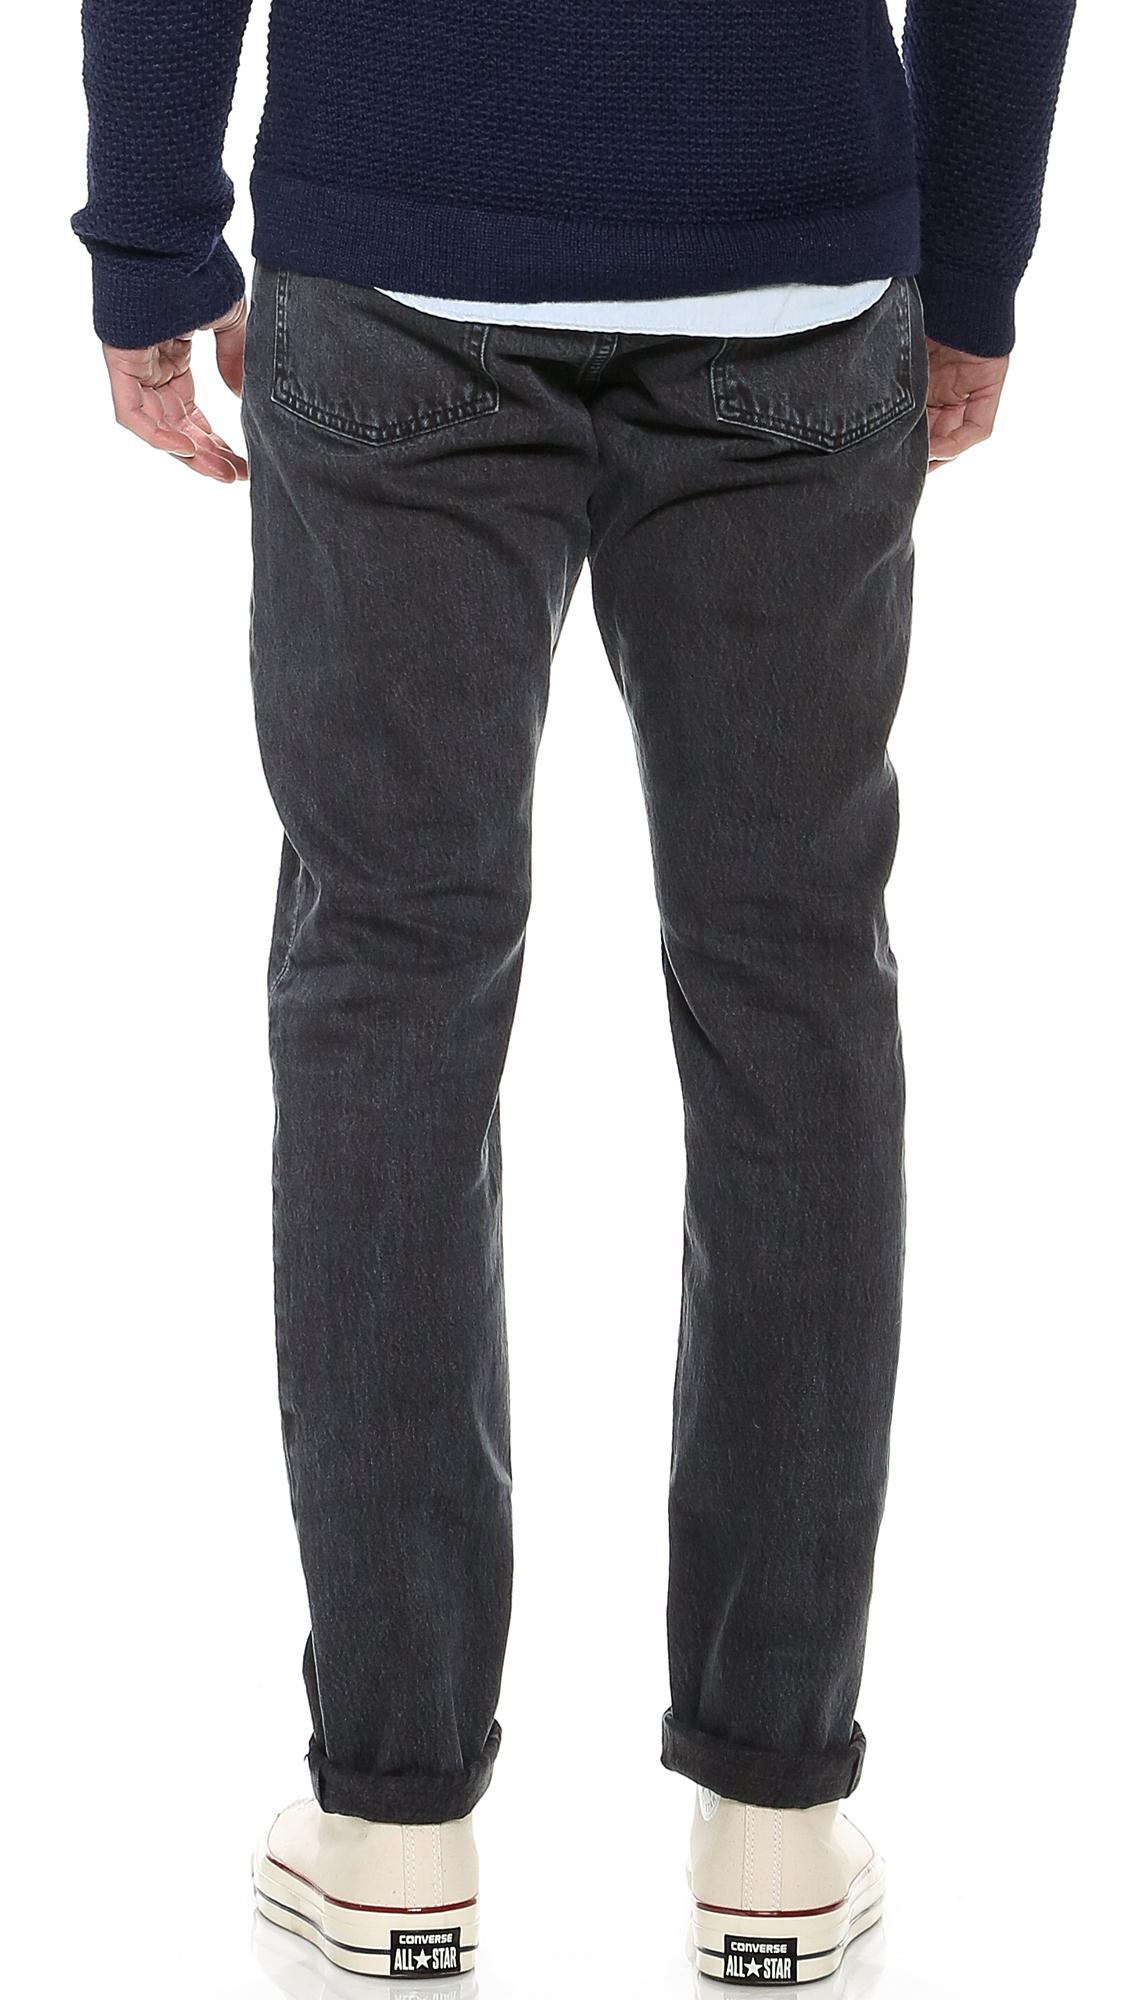 Black Overdye Jeans